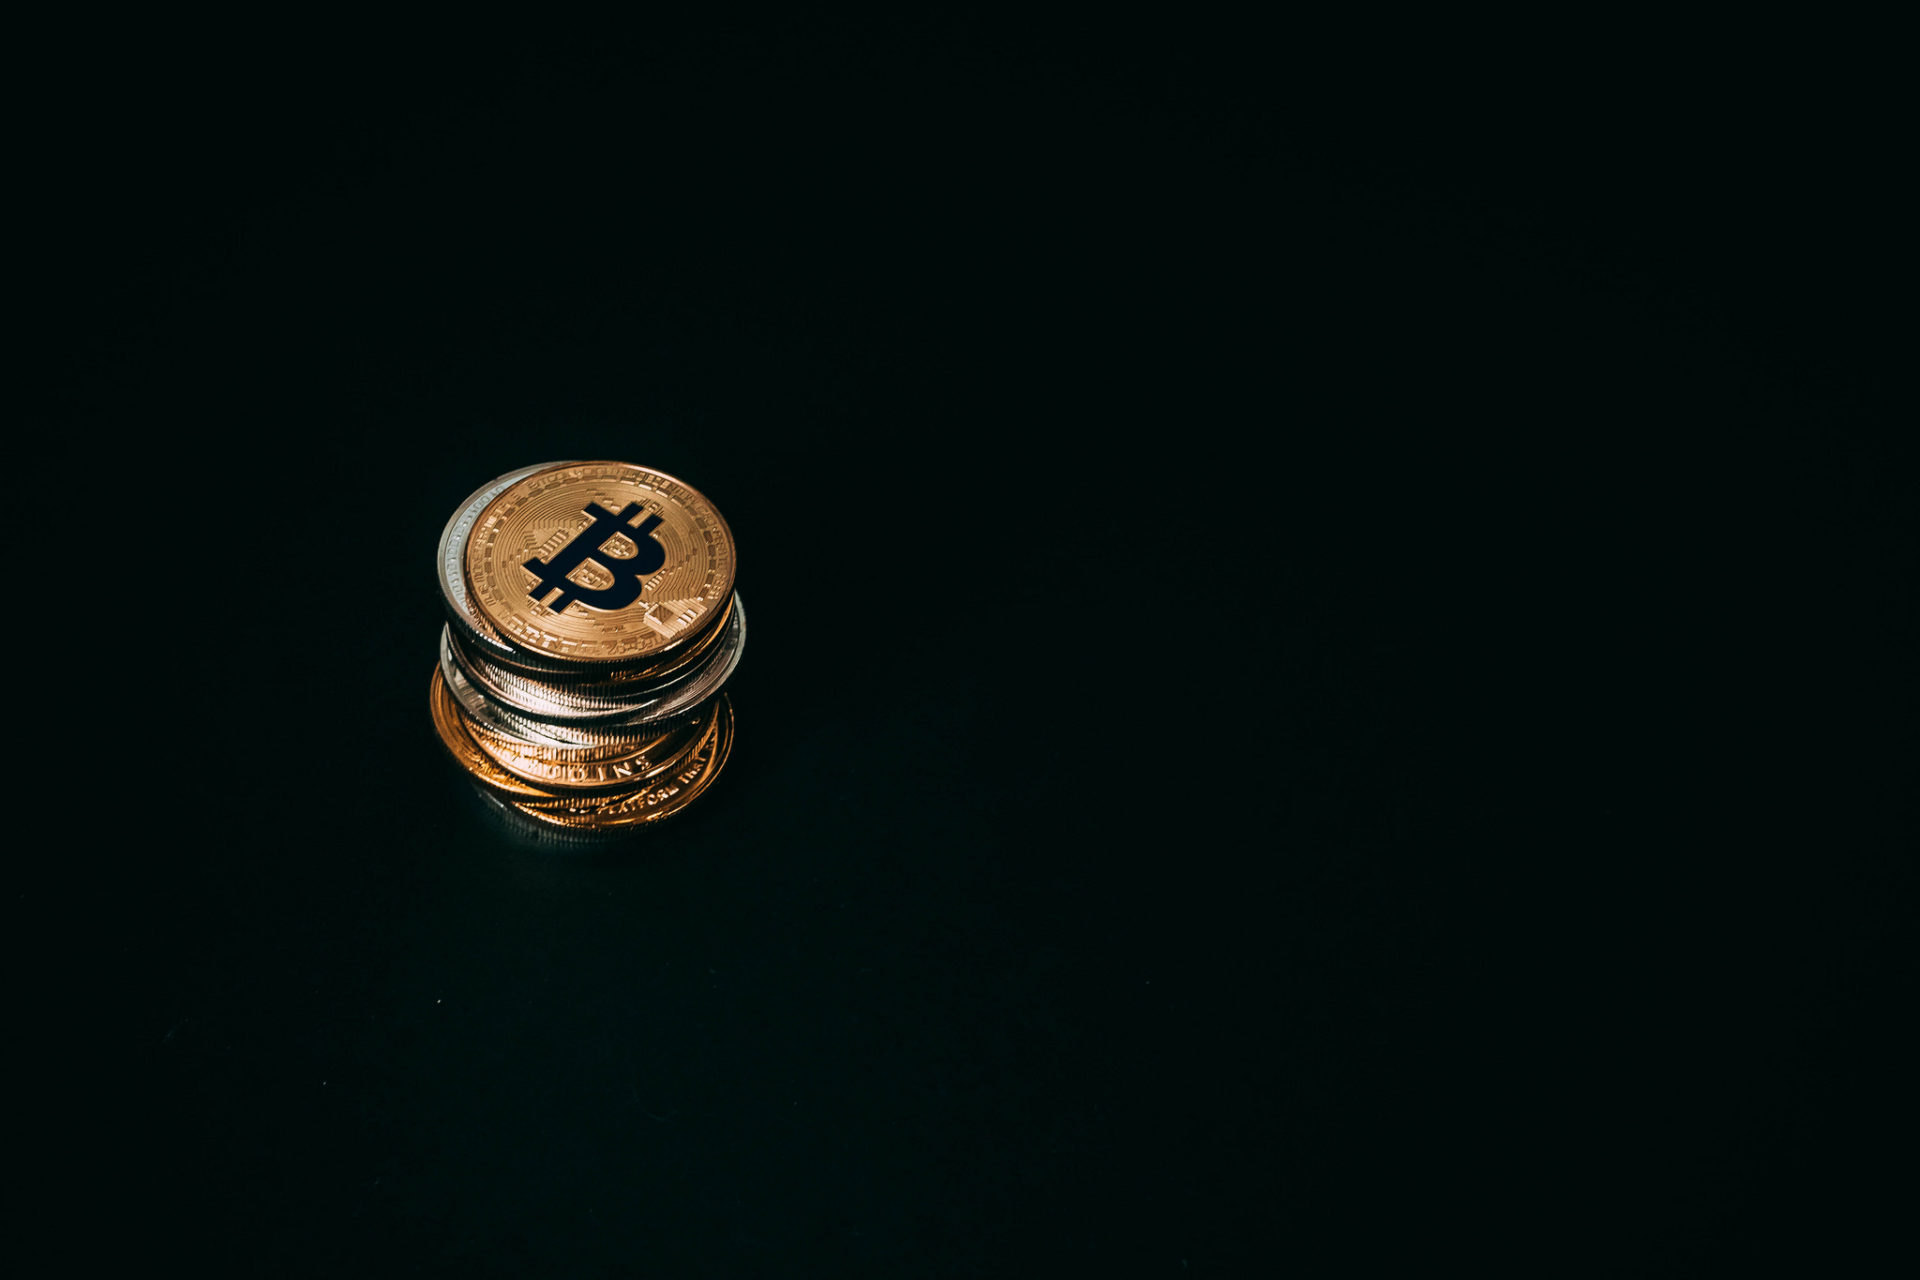 Bitcoin (BTC) Stabilizes Above $4,500, (Some) Bullish Sentiment Returns 13